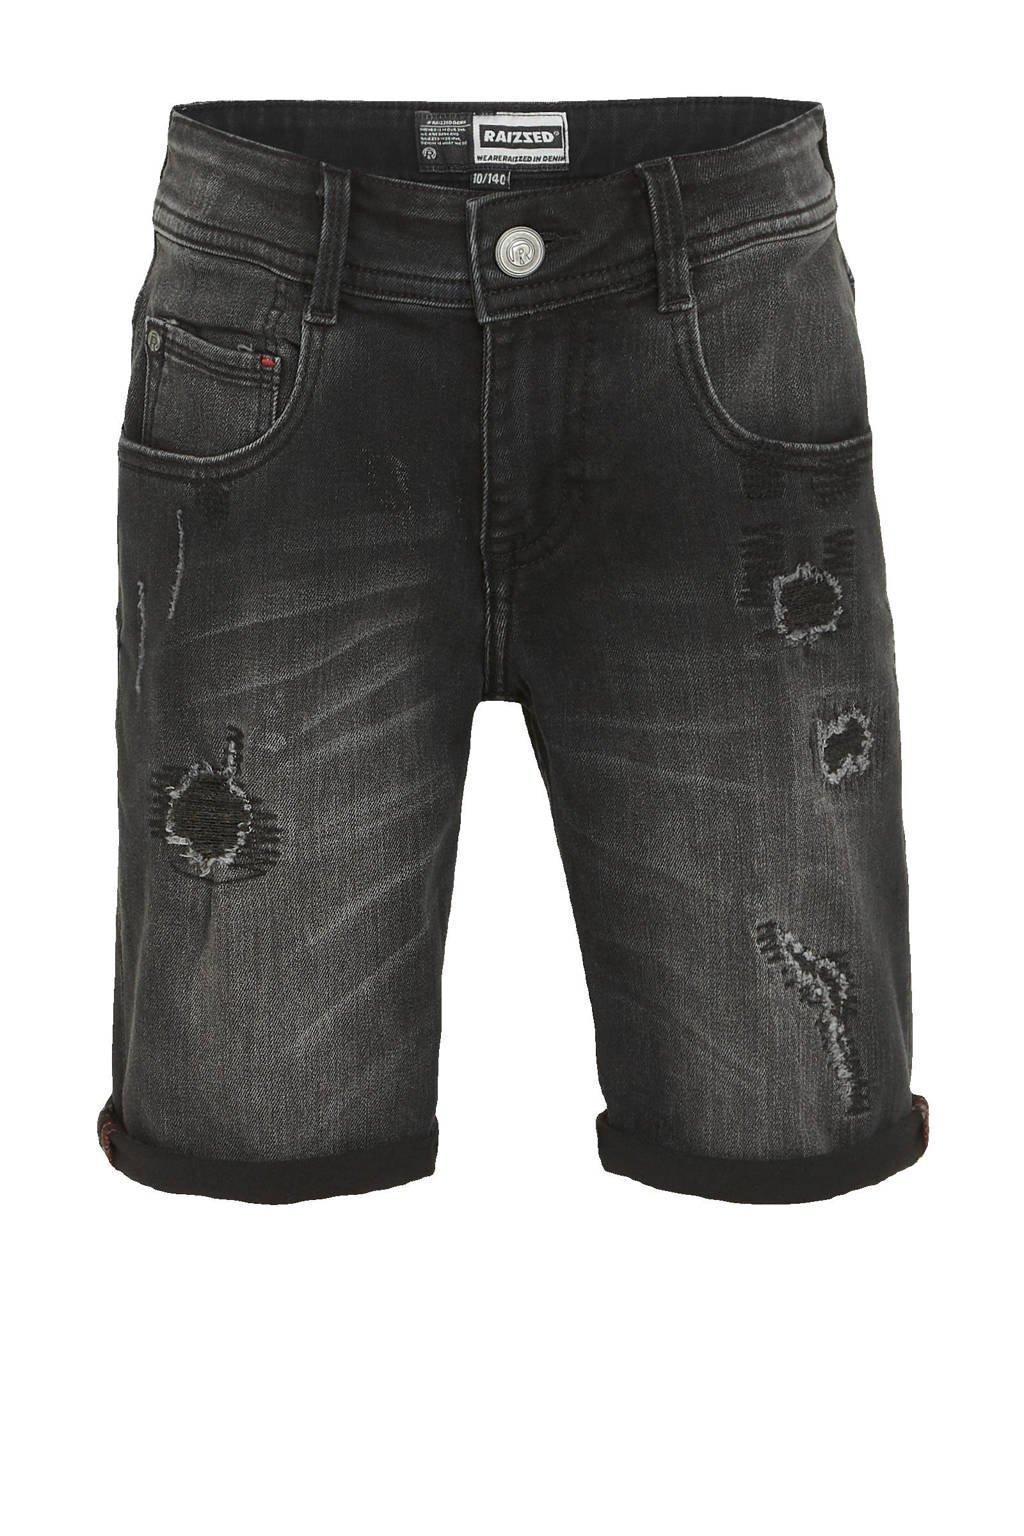 Raizzed jeans bermuda Oregon vintage grey, Vintage grey